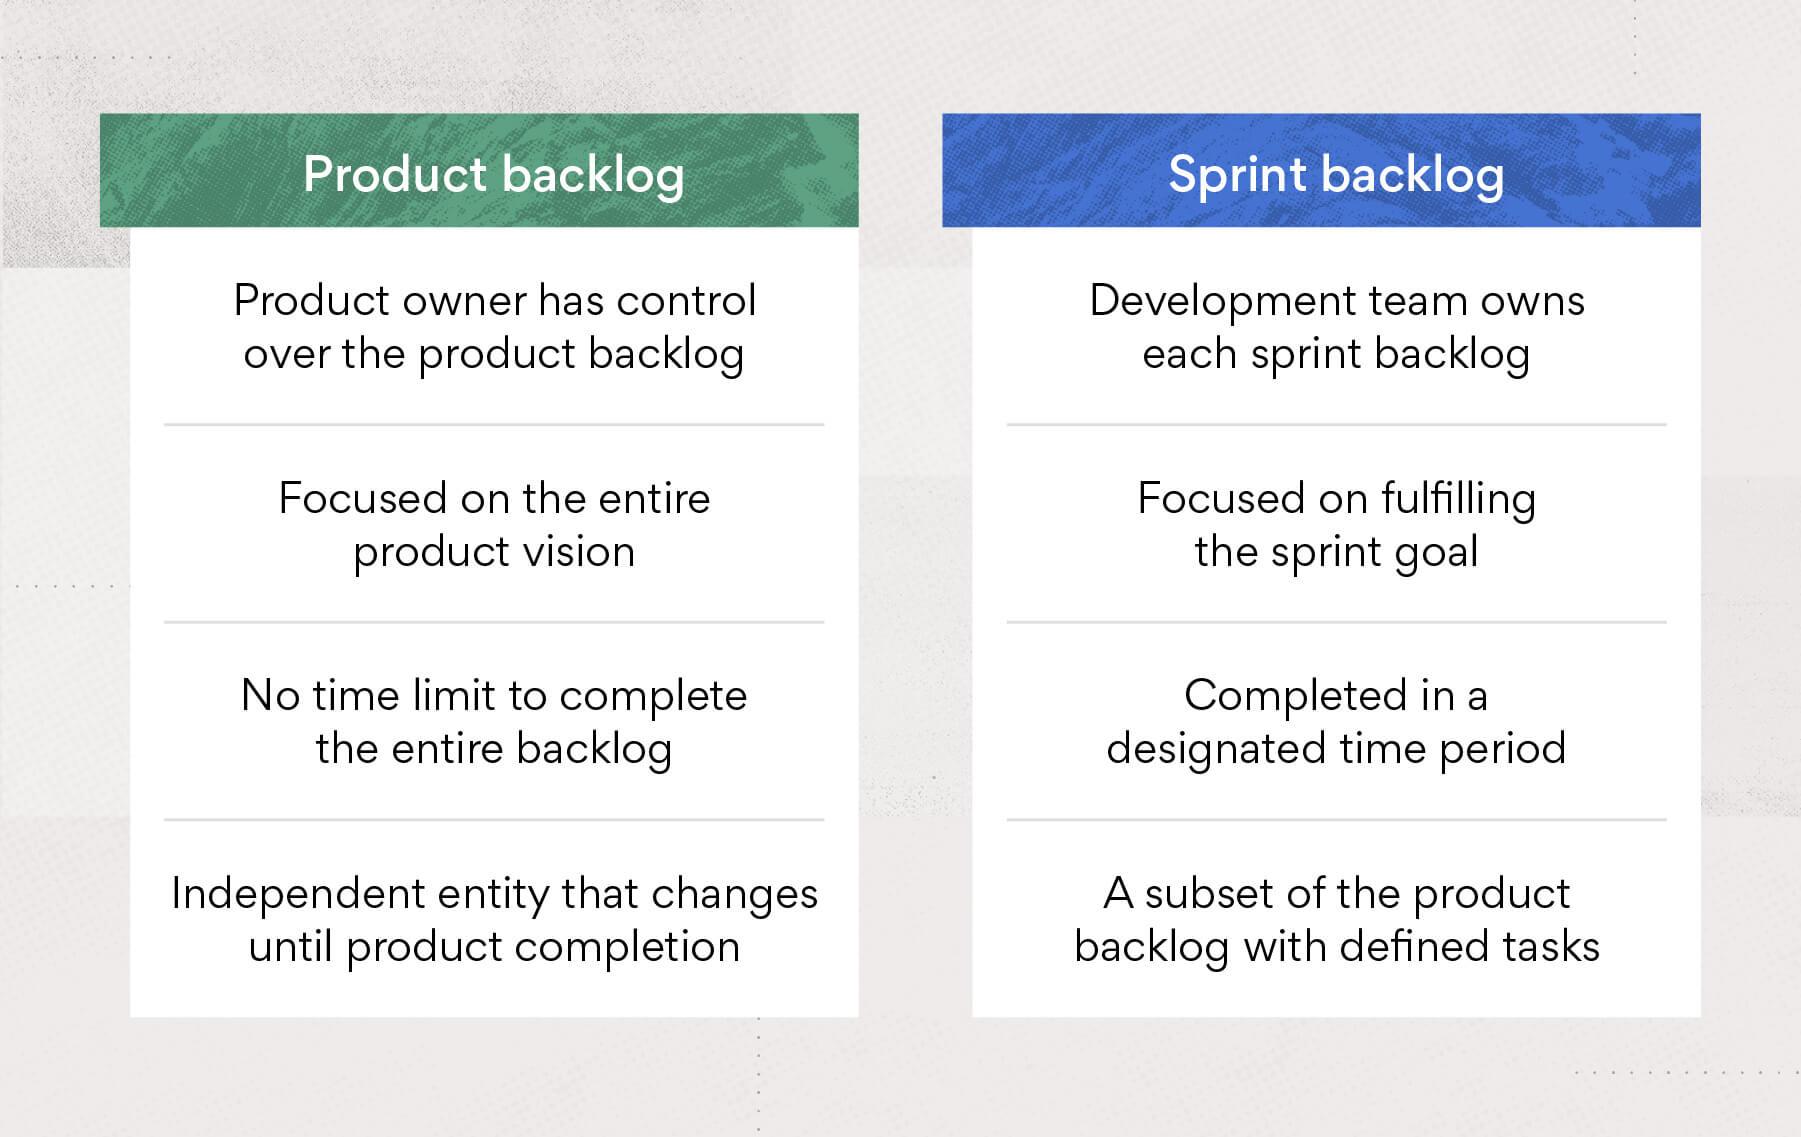 Sprint backlog vs. product backlog